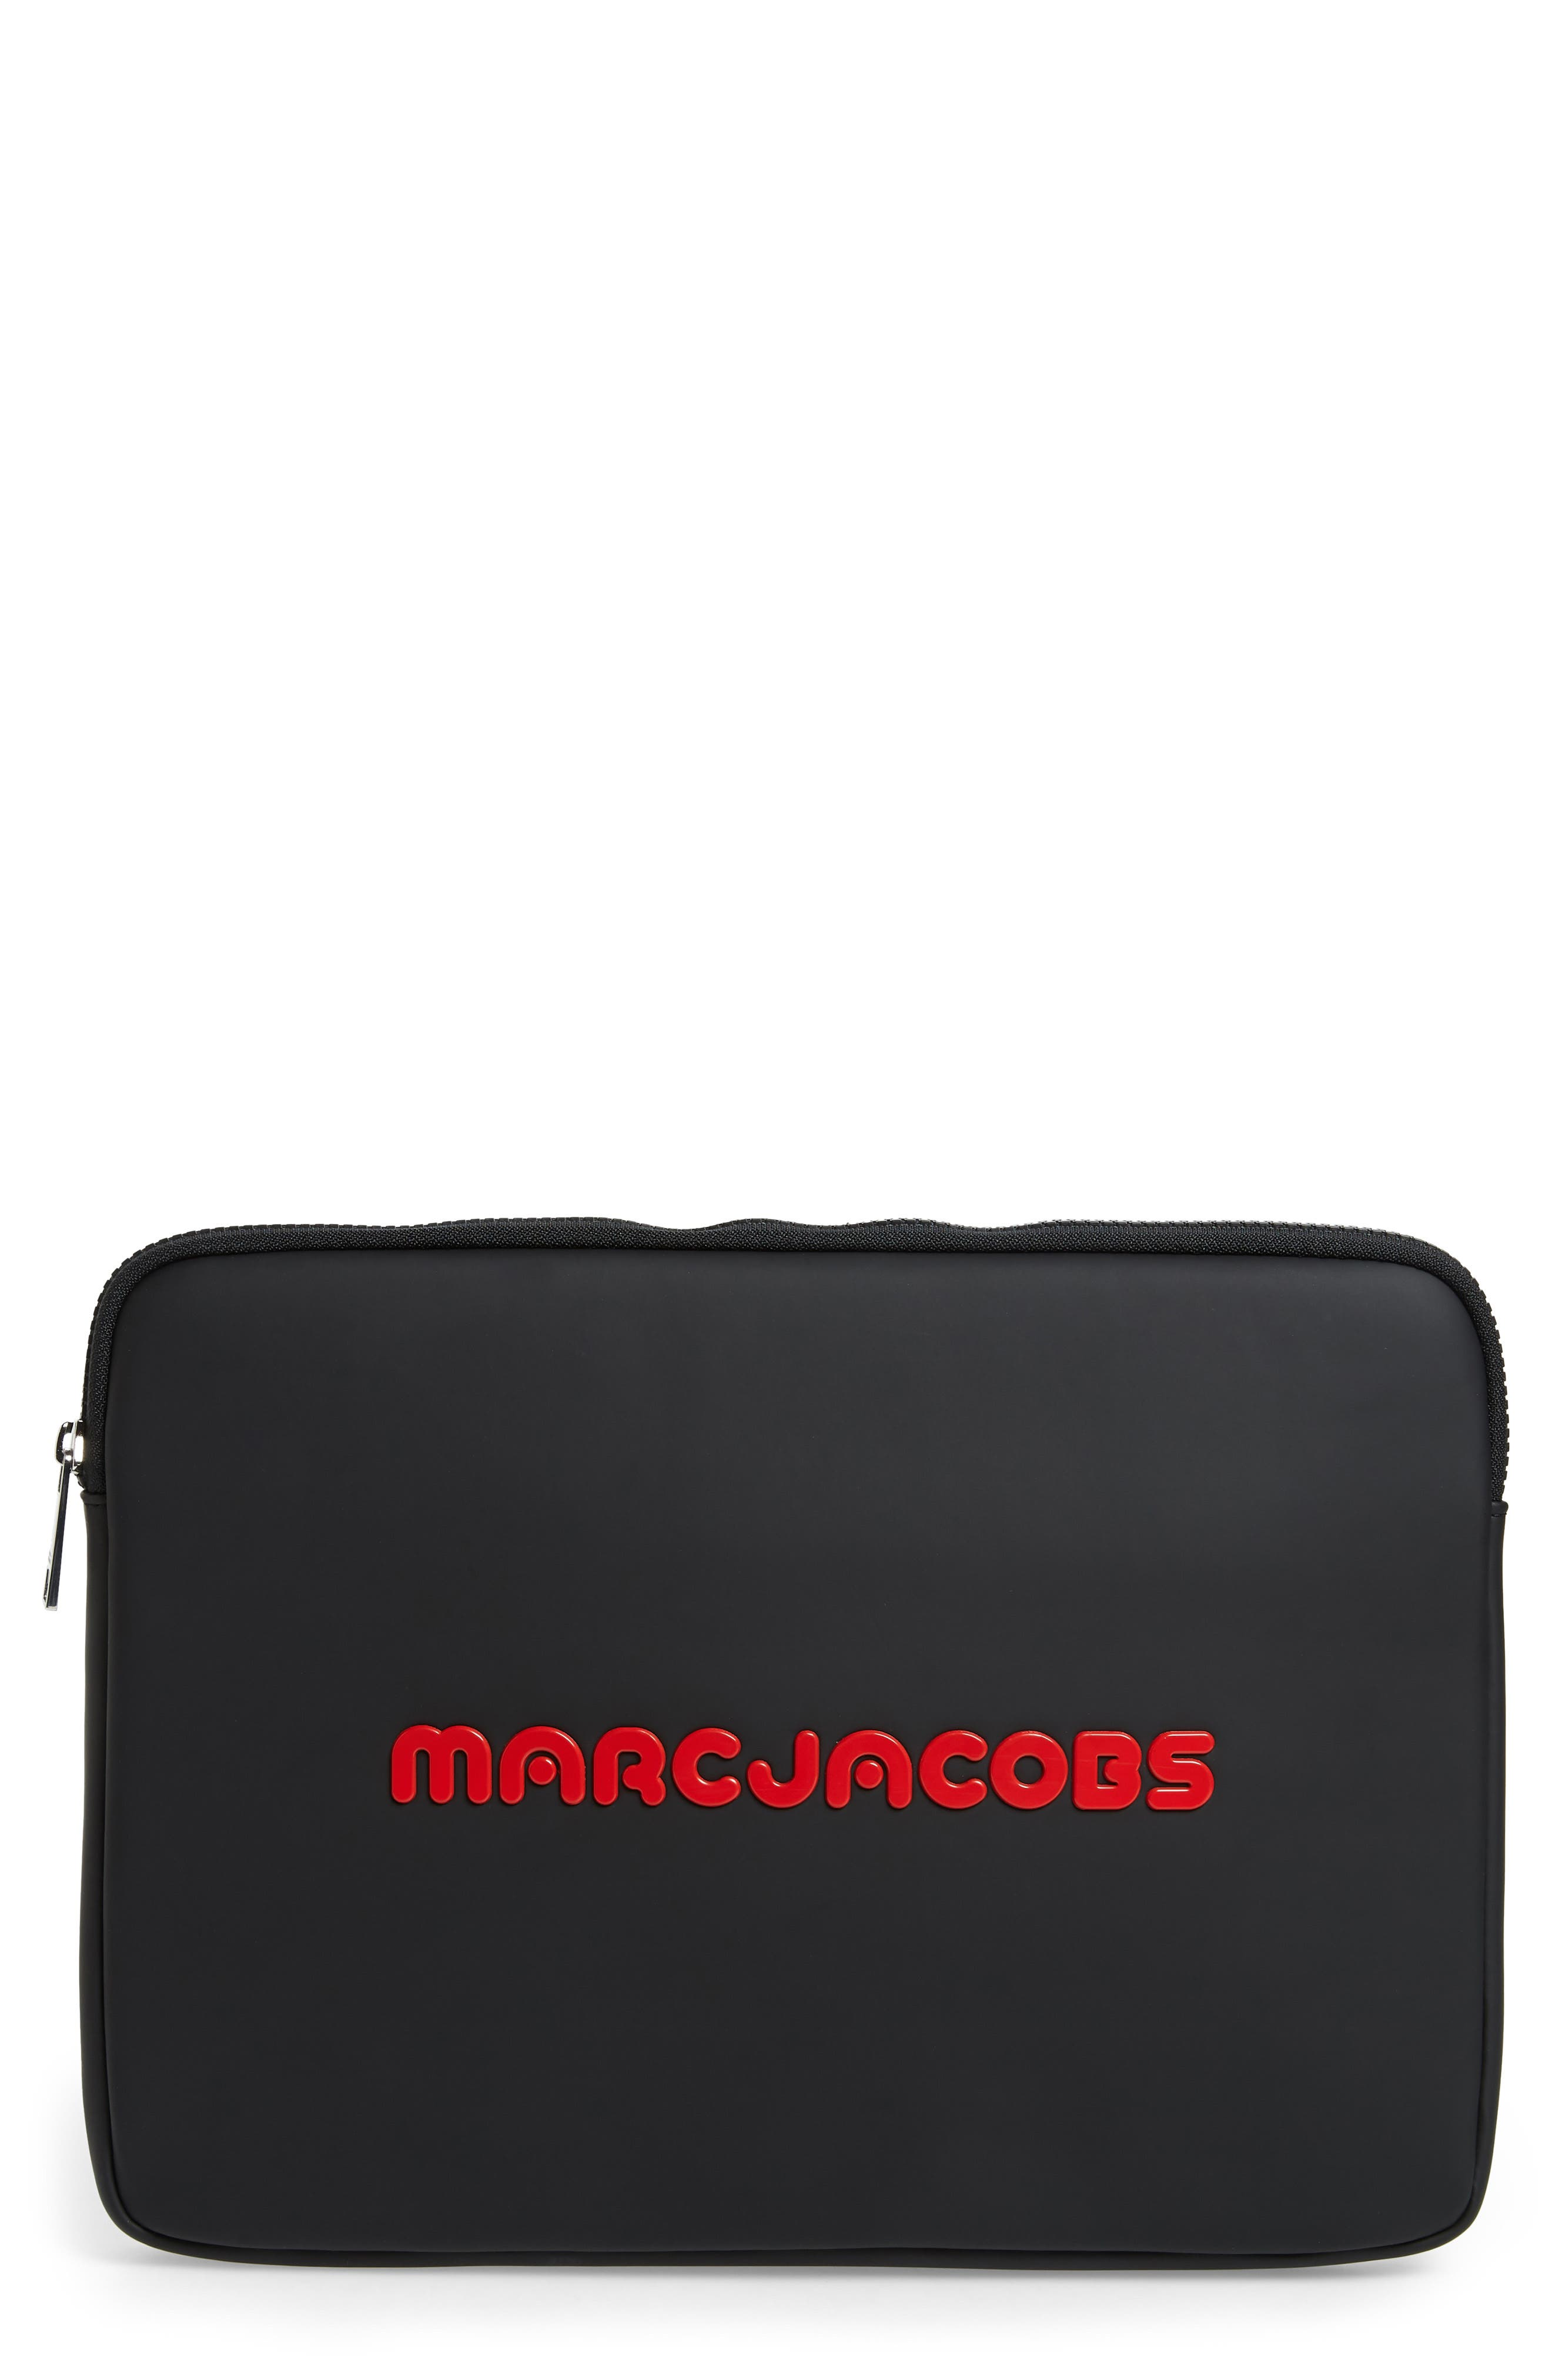 MARC JACOBS Logo 13-Inch Computer Case